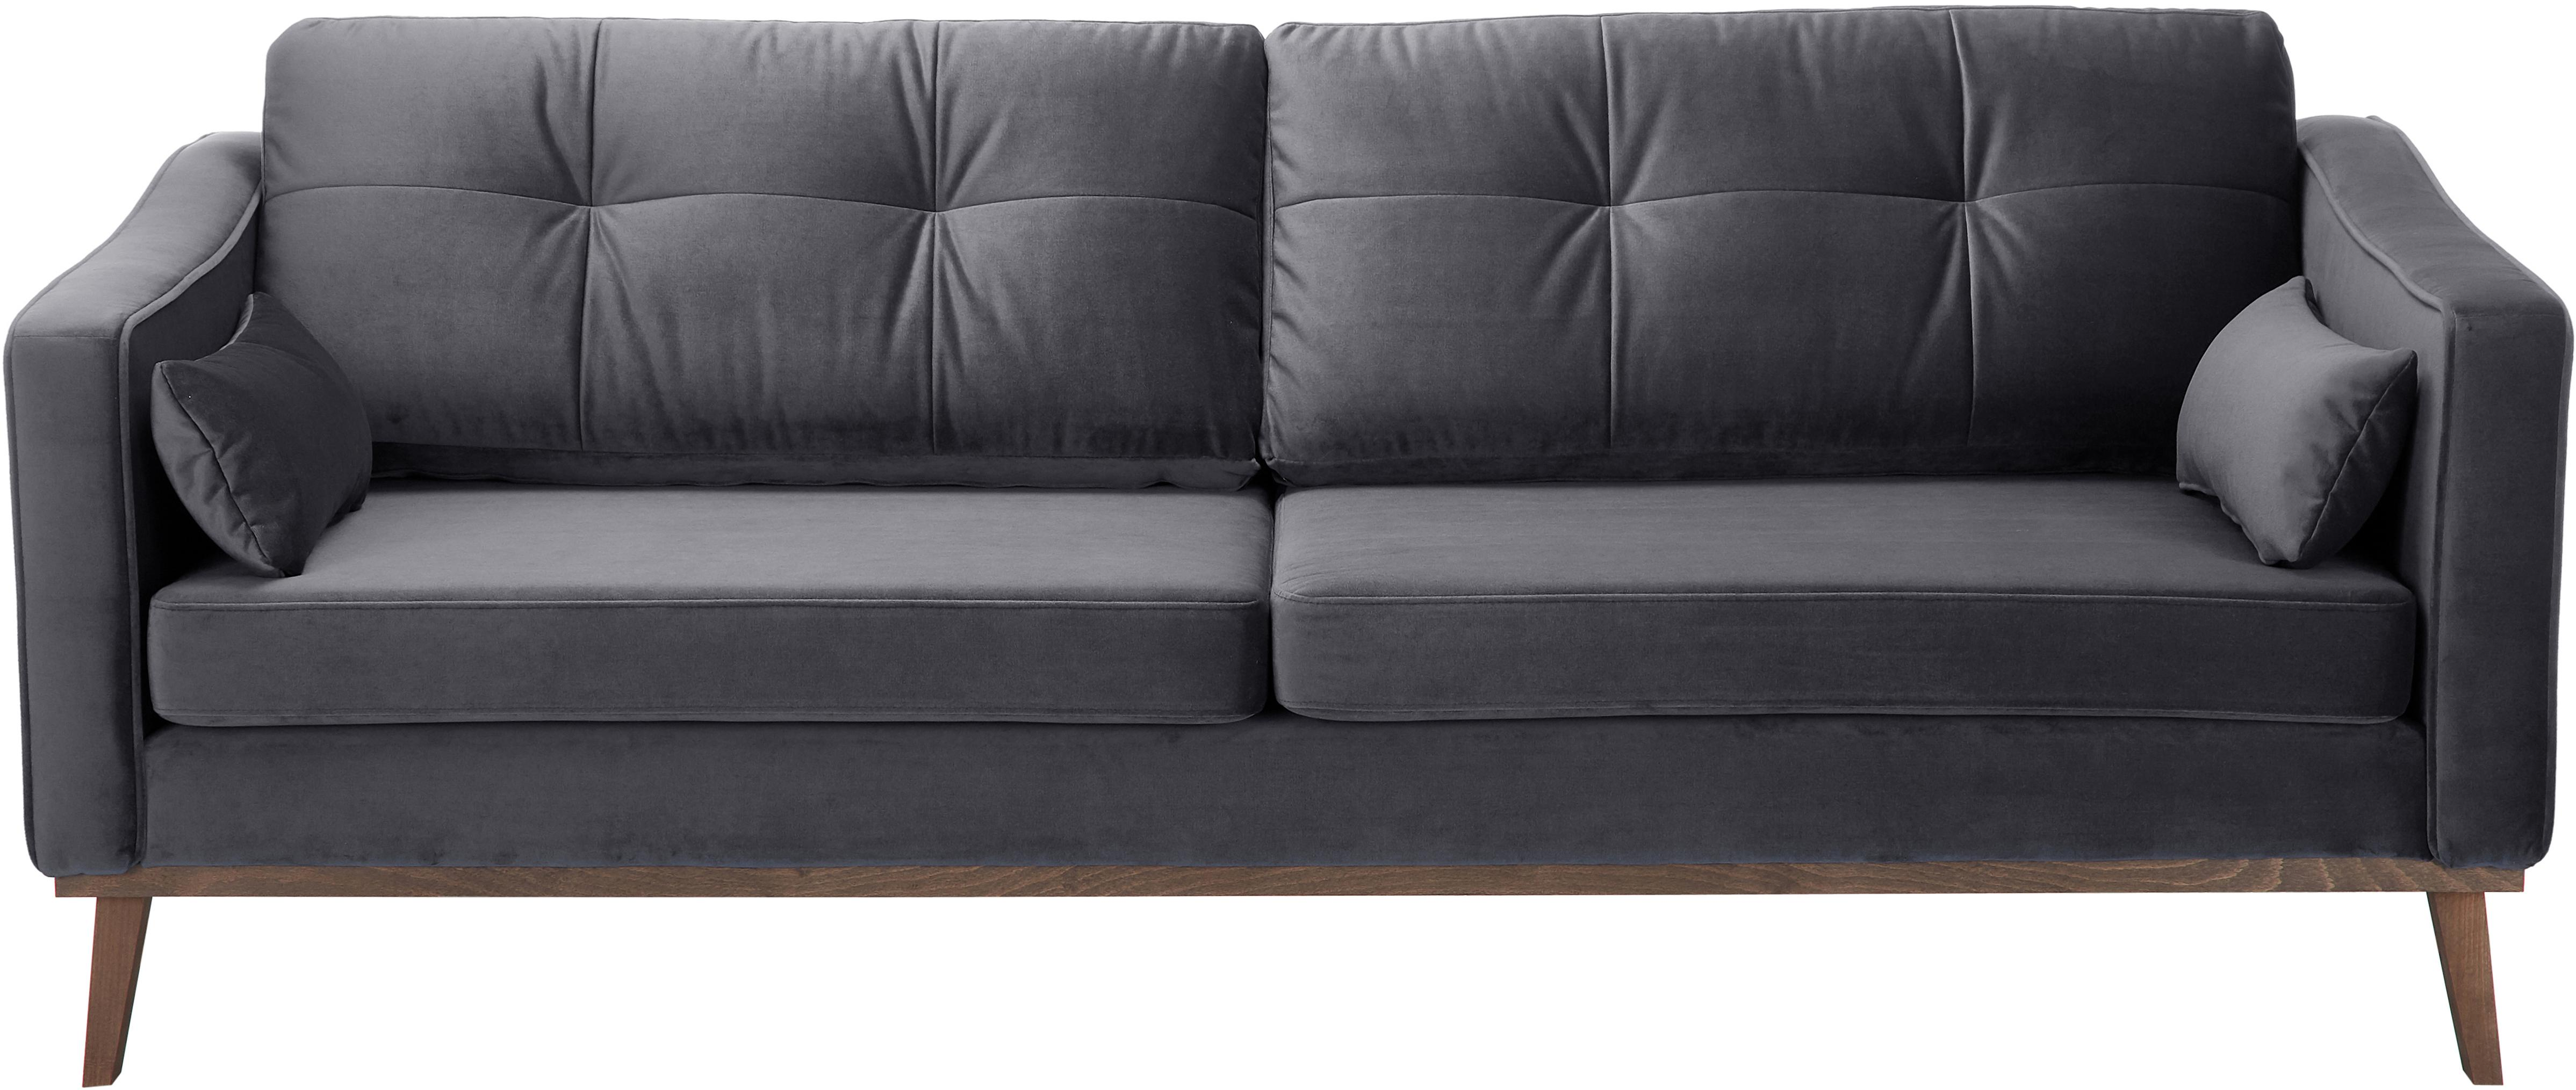 Samt-Sofa Alva (3-Sitzer), Bezug: Samt (Hochwertiger Polyes, Gestell: Massives Kiefernholz, Samt Dunkelgrau, B 215 x T 92 cm